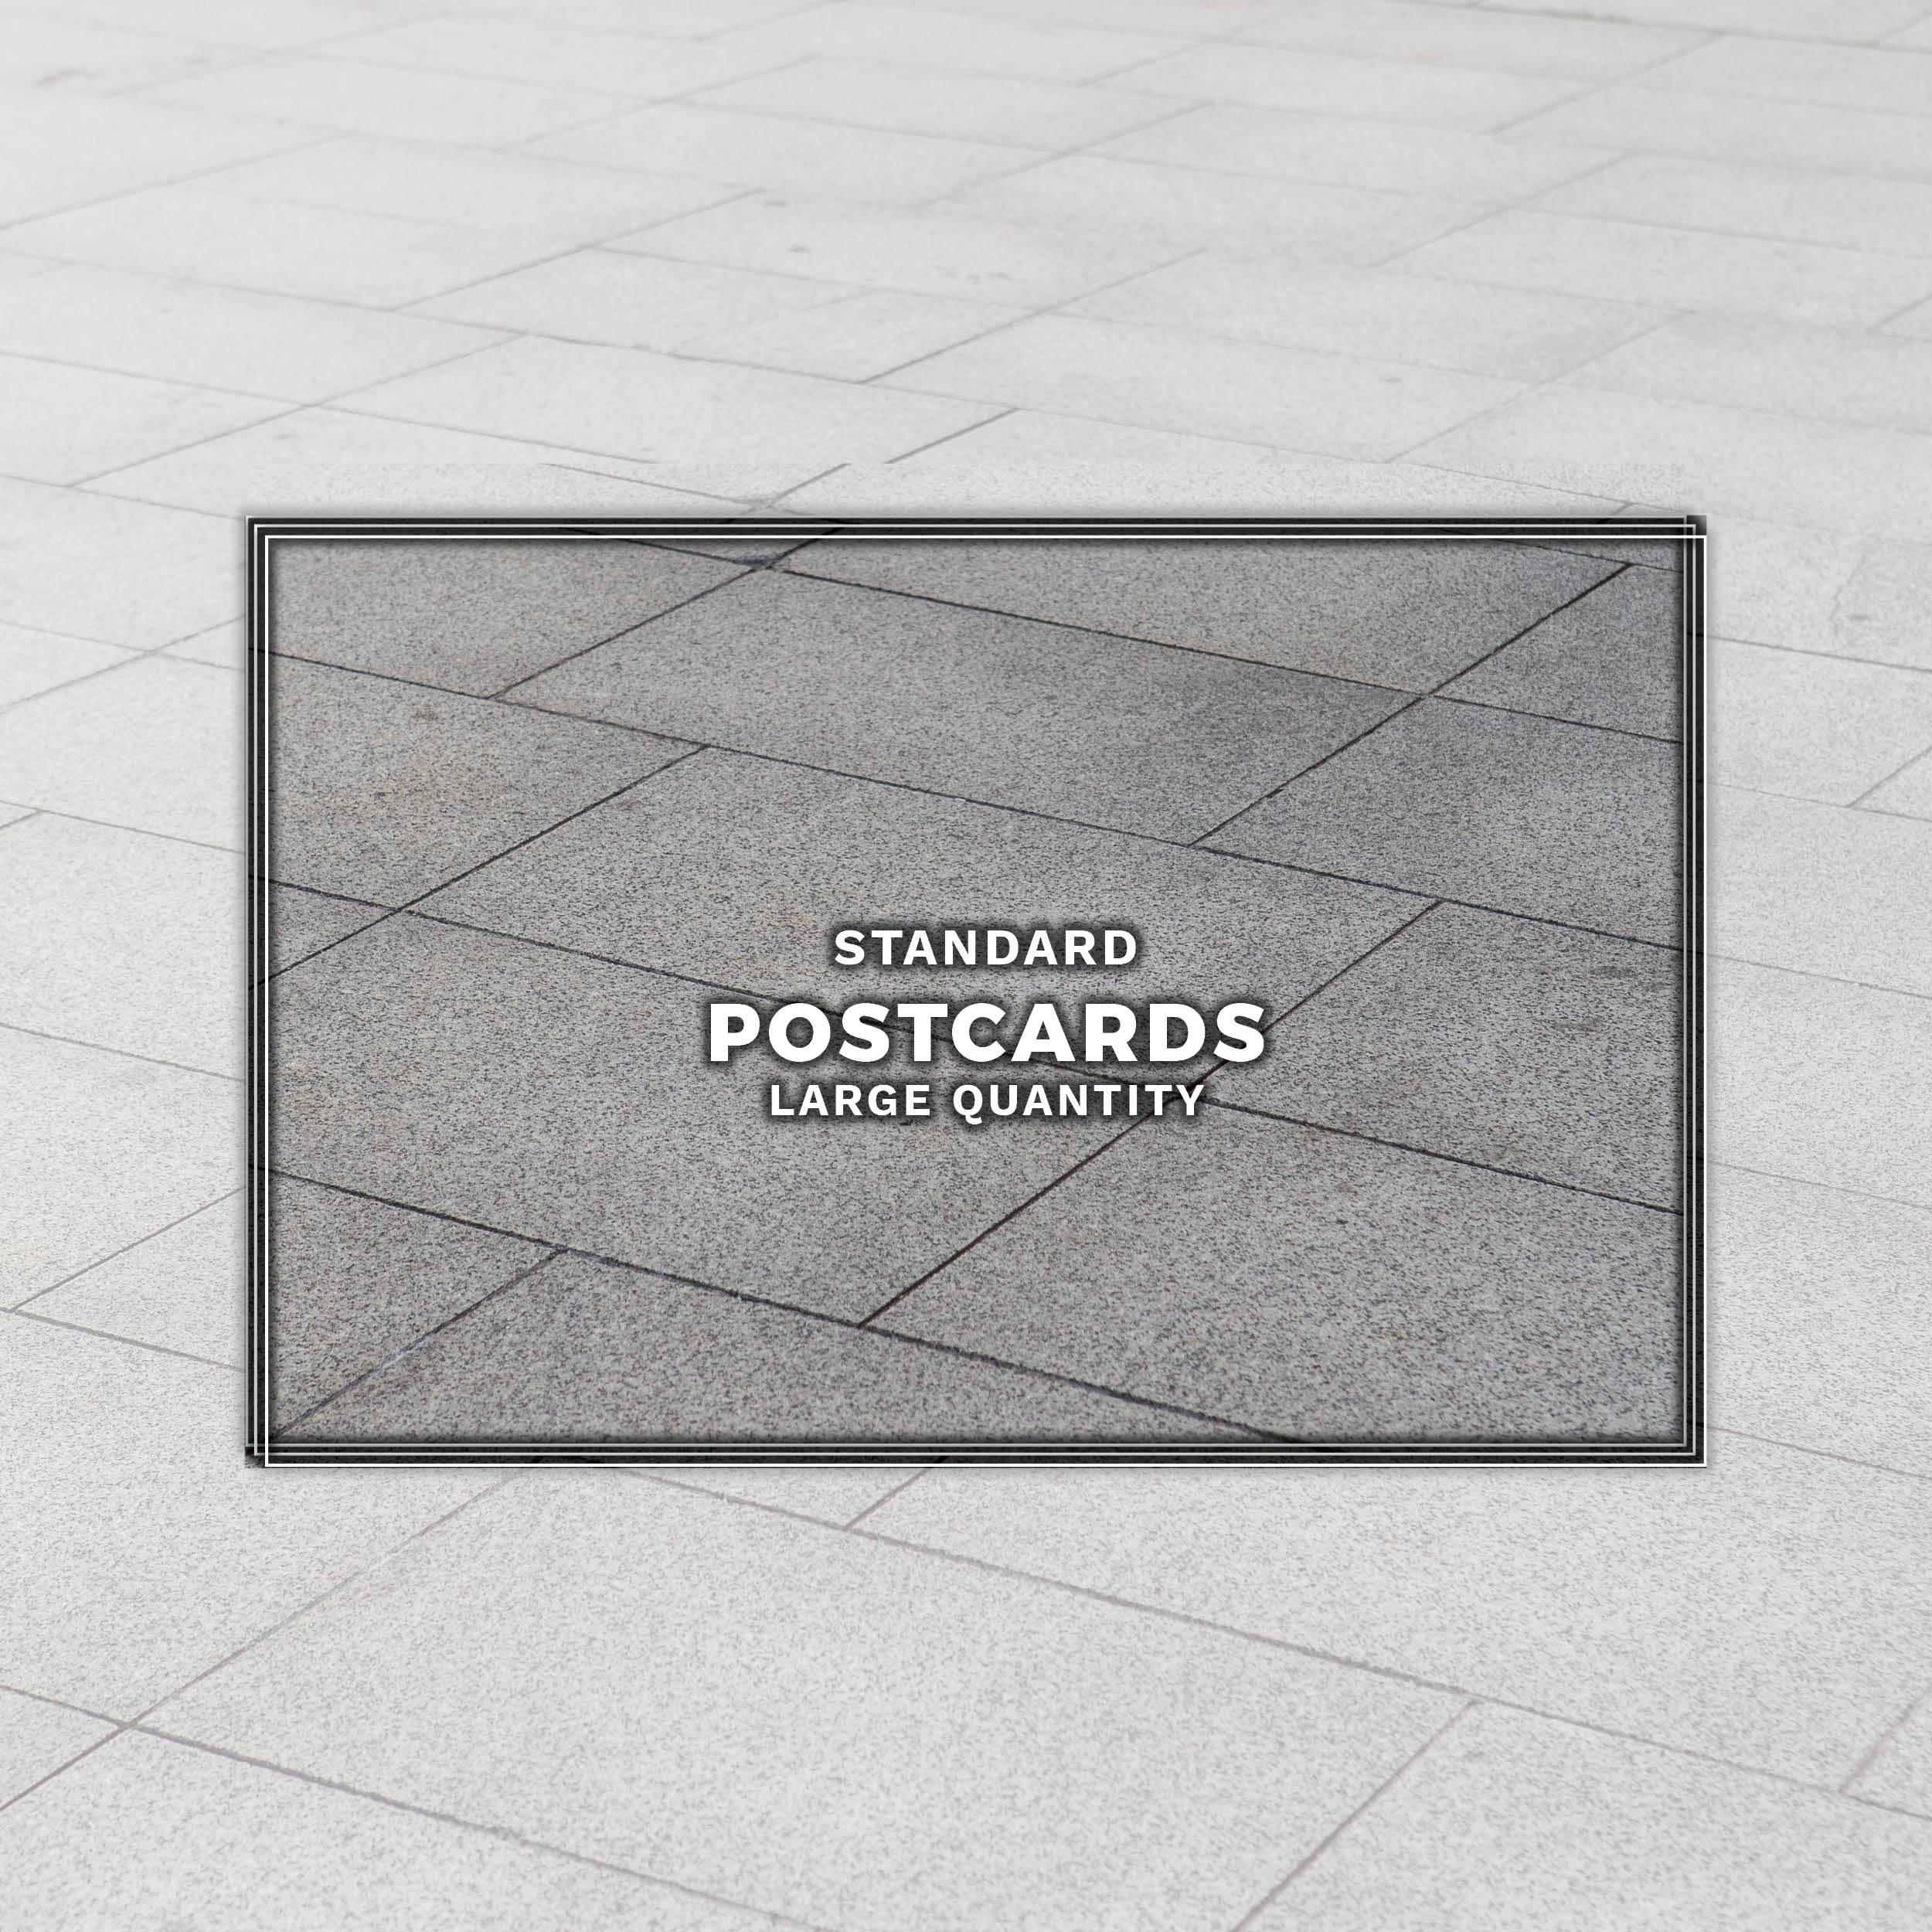 Postcard printing banner